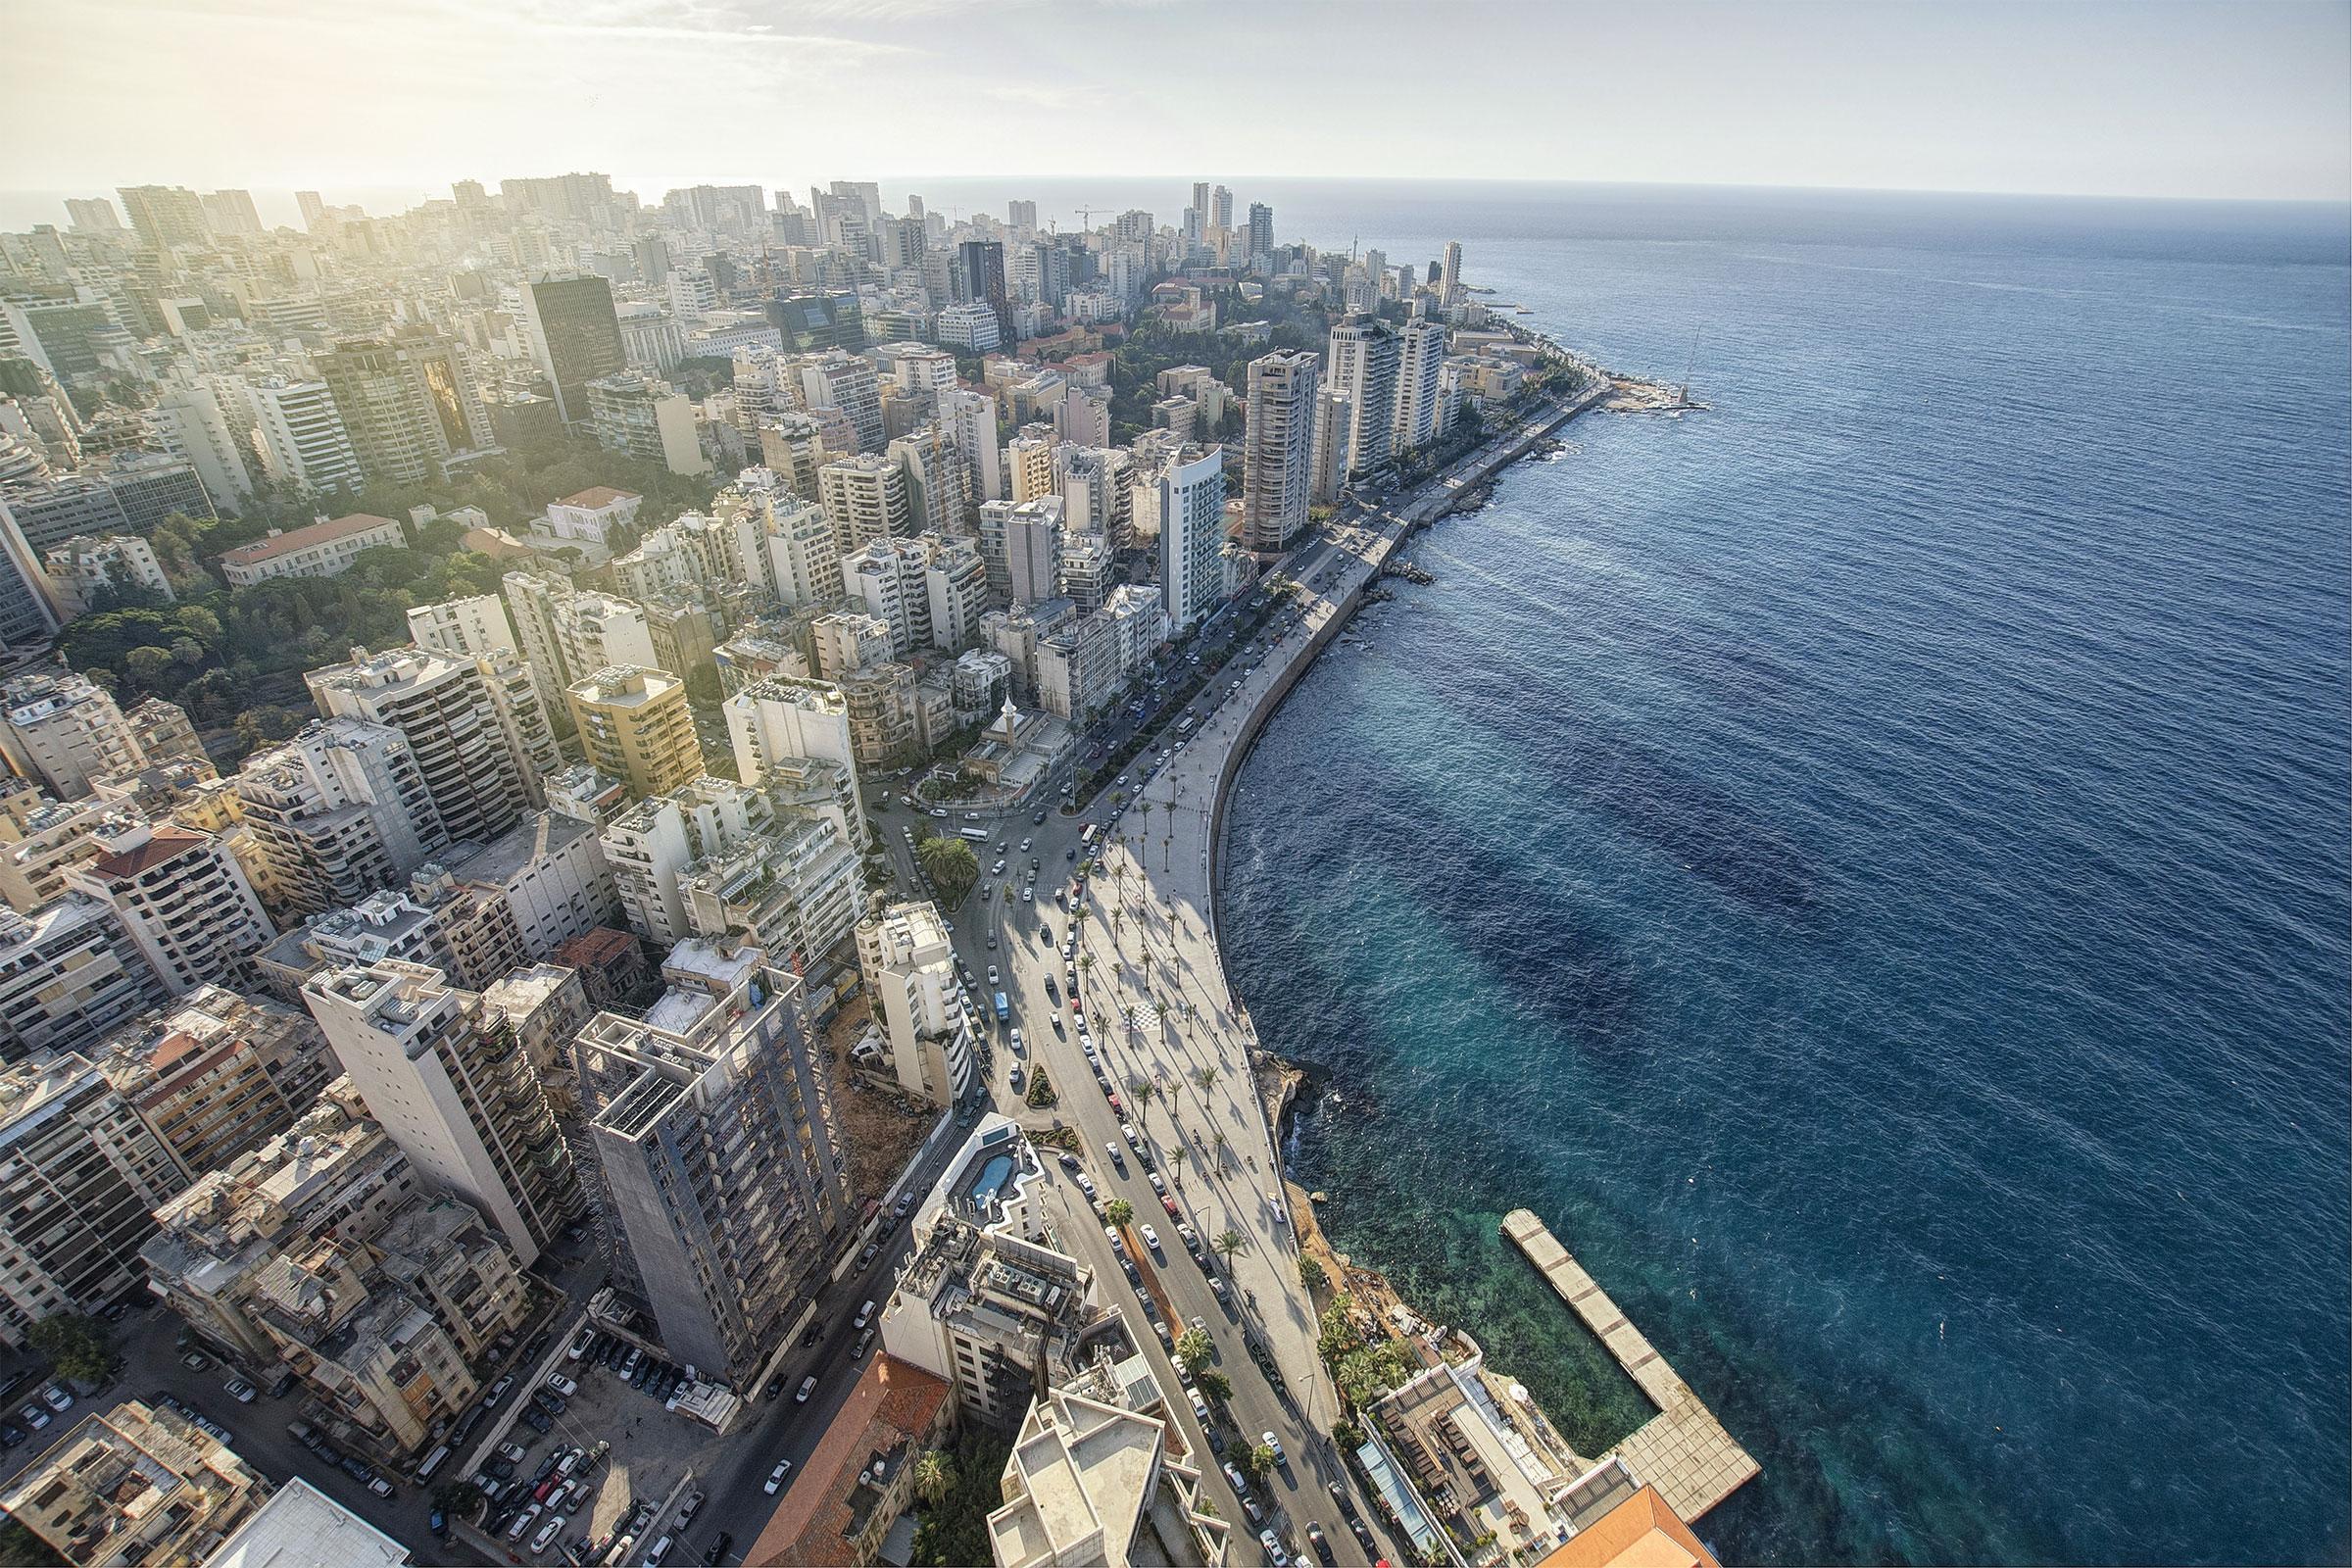 Aerial View of Beirut Lebanon